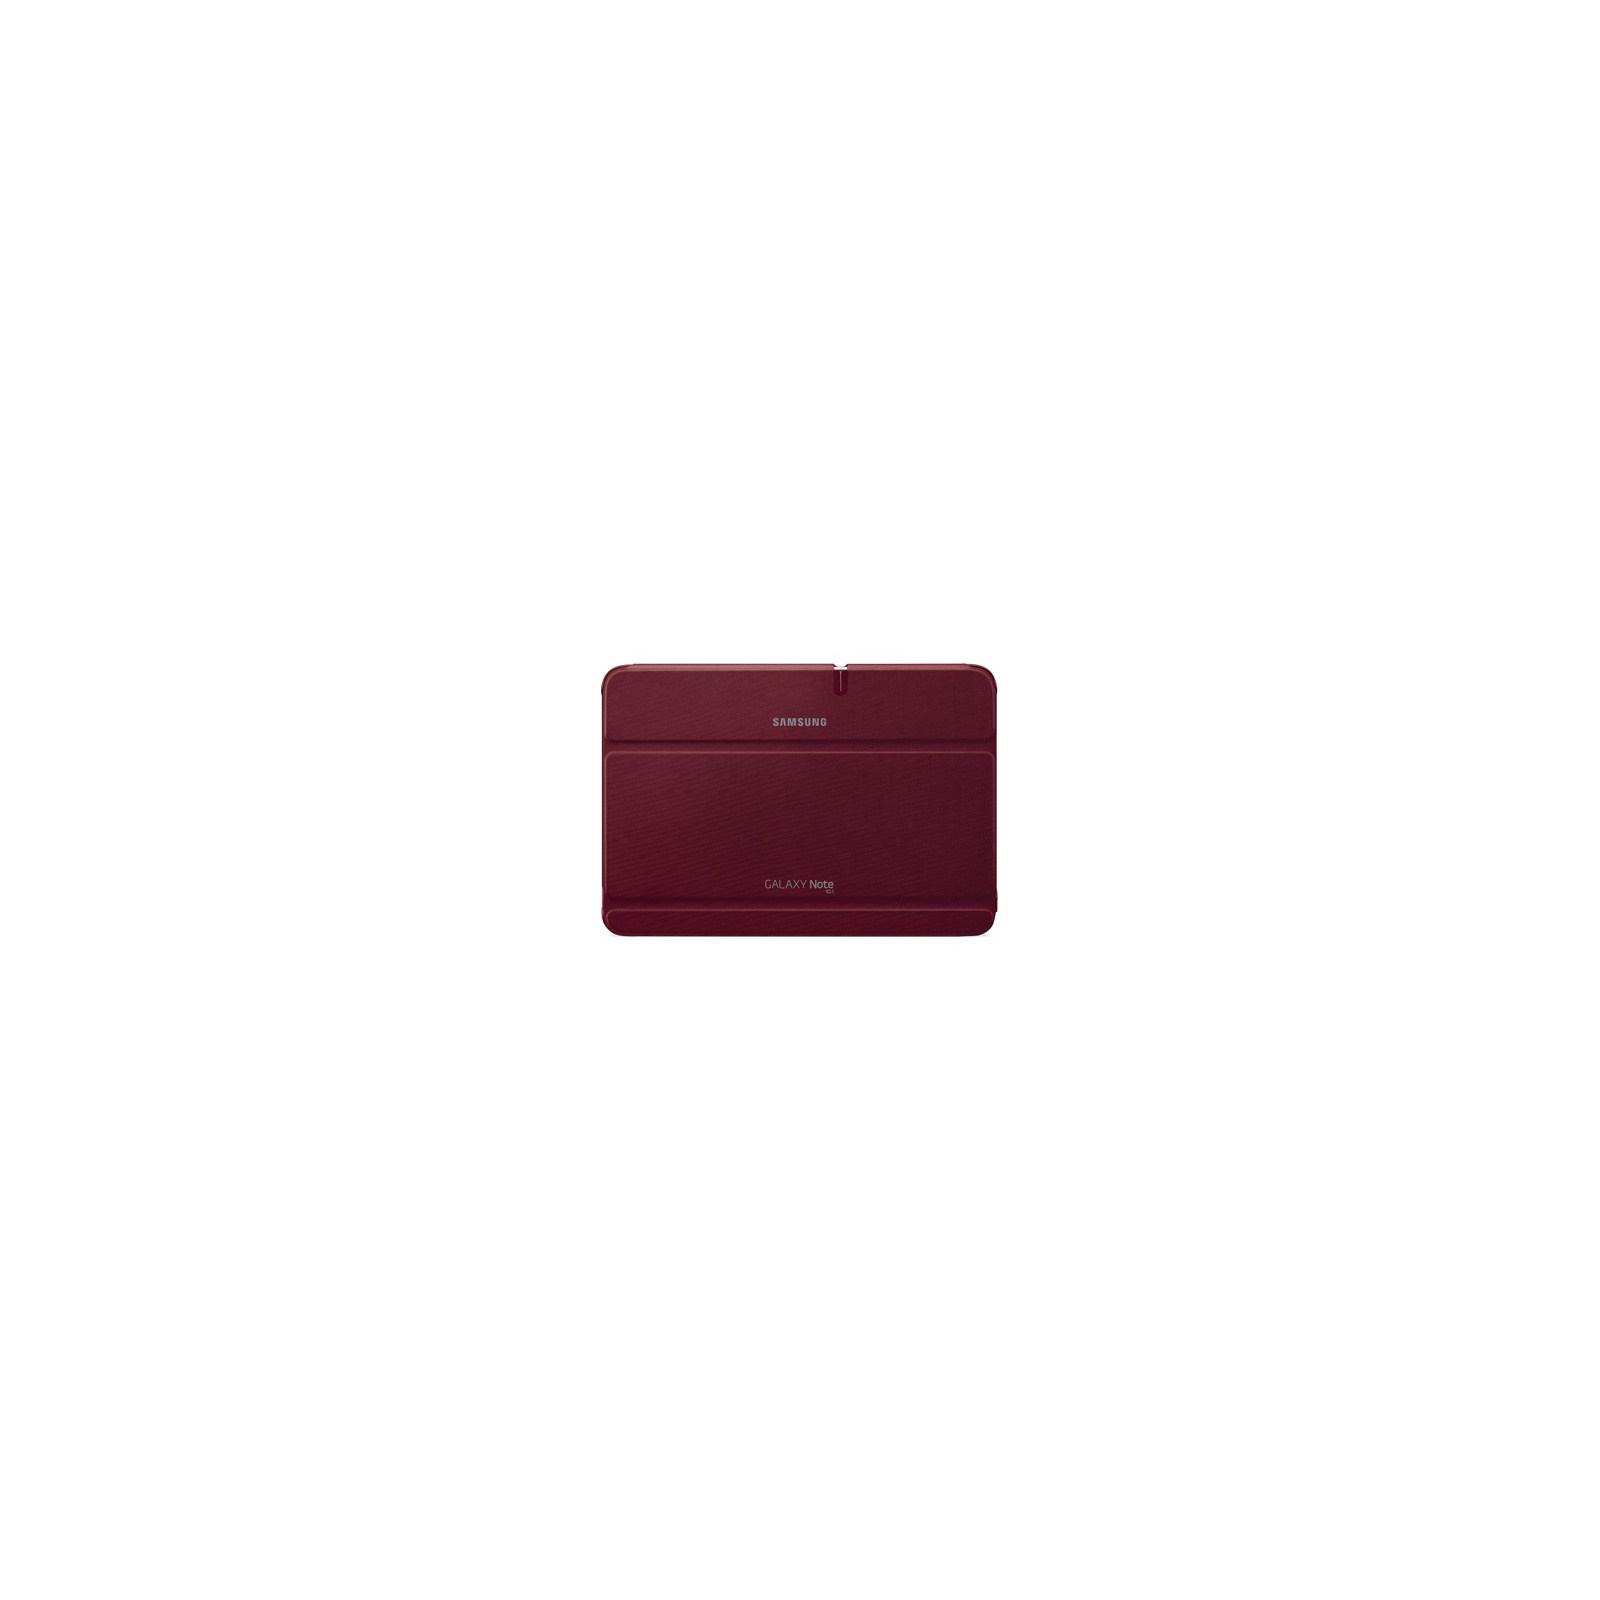 "Чехол для планшета Samsung N8000, 10.1"" Garnet Red (EFC-1G2NRECSTD)"